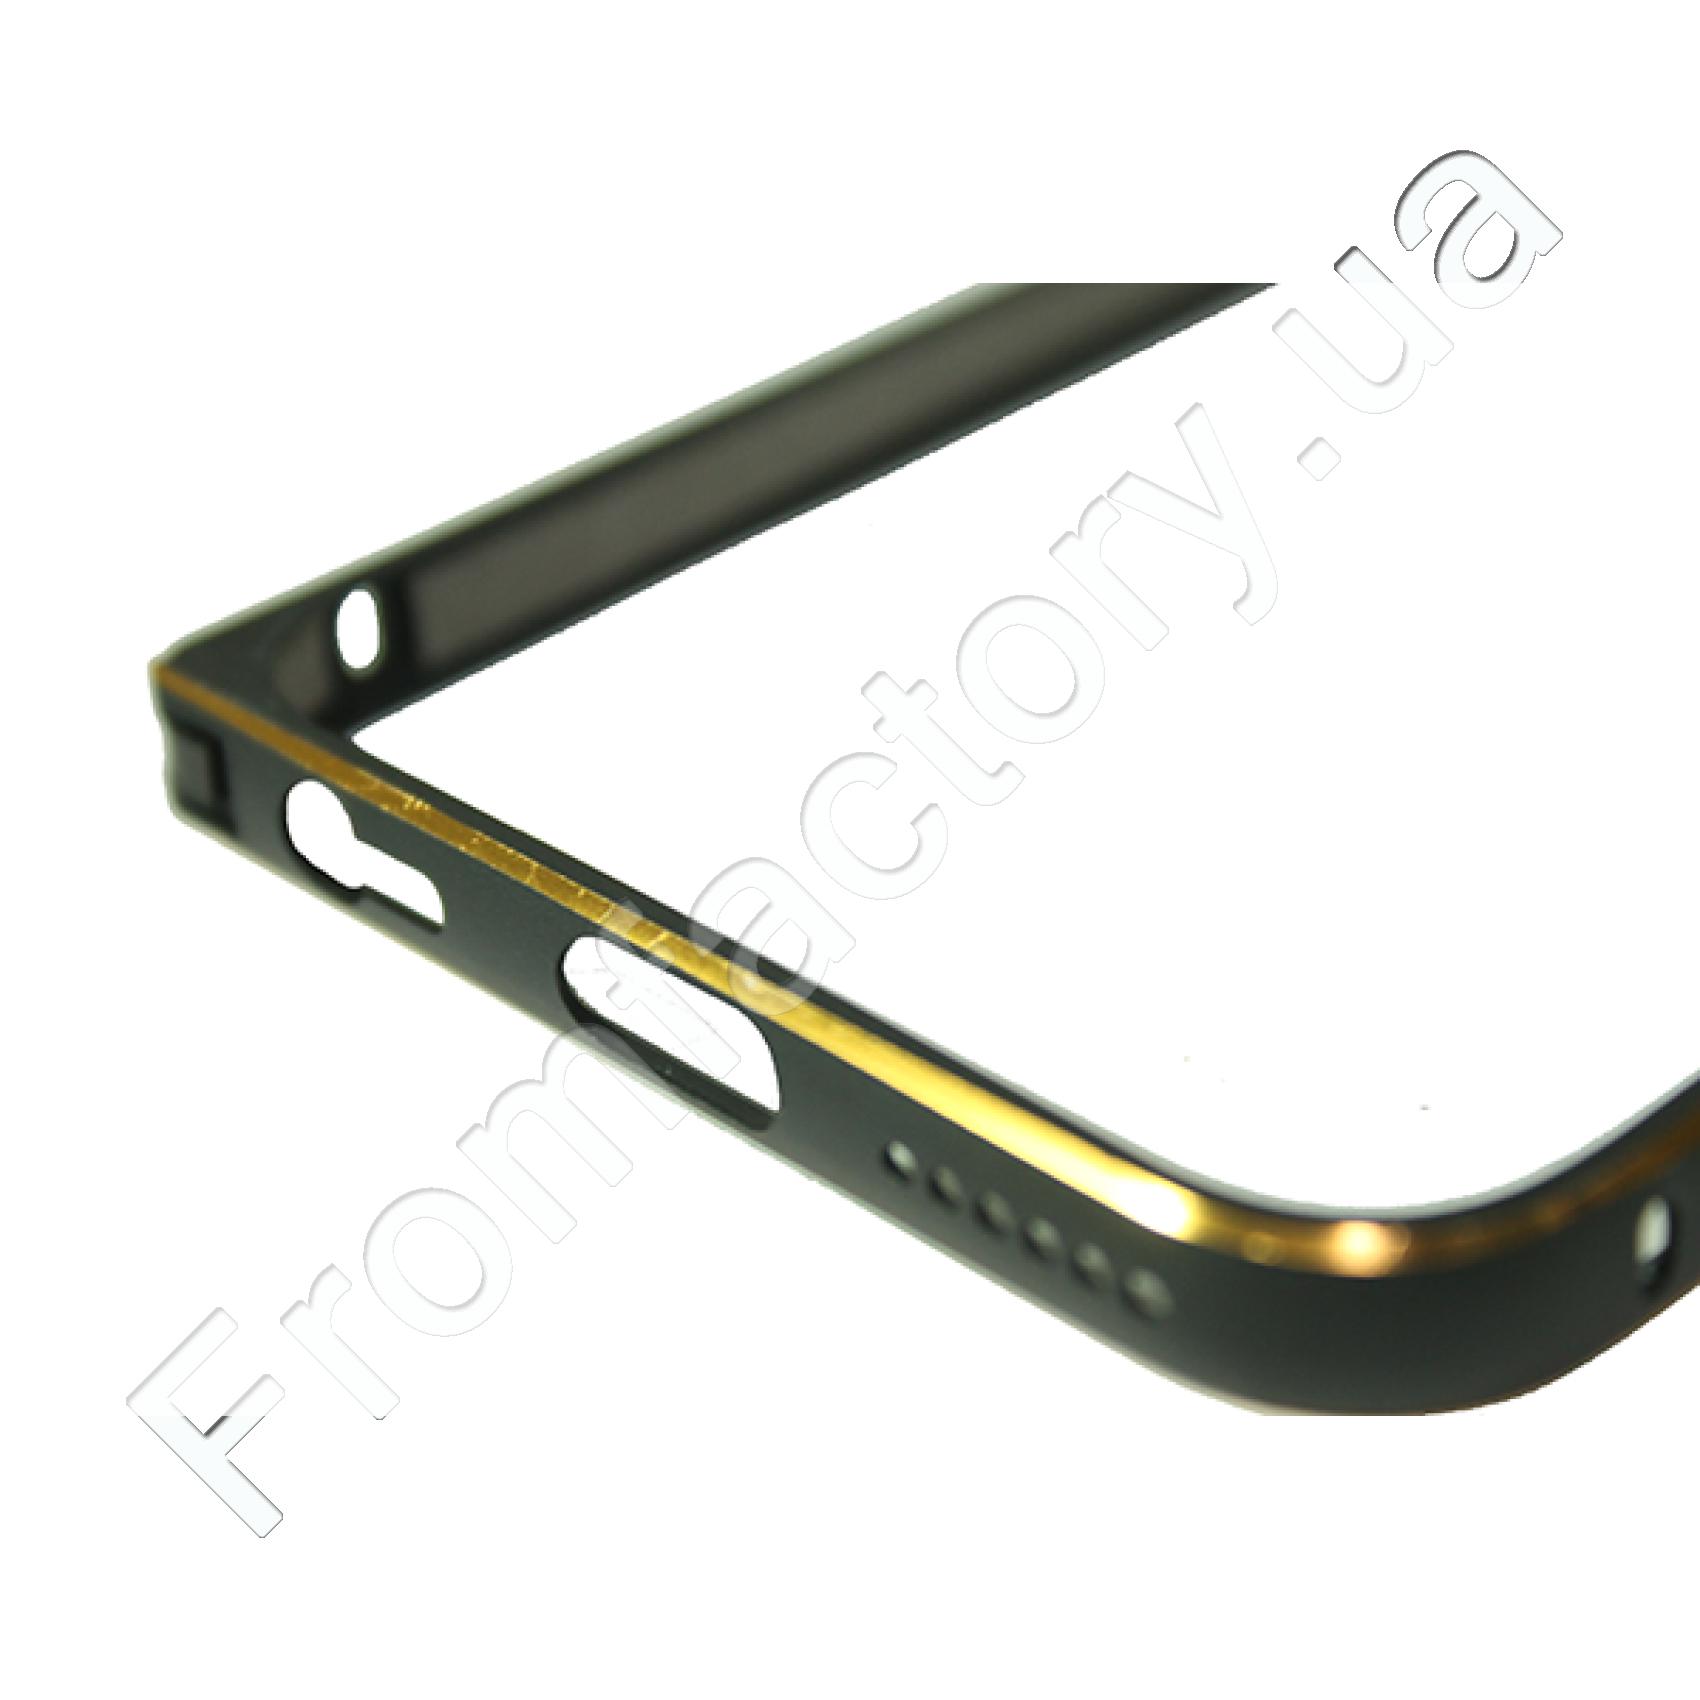 Бампер металлический с застежкой на IPhone 5/5s/SE